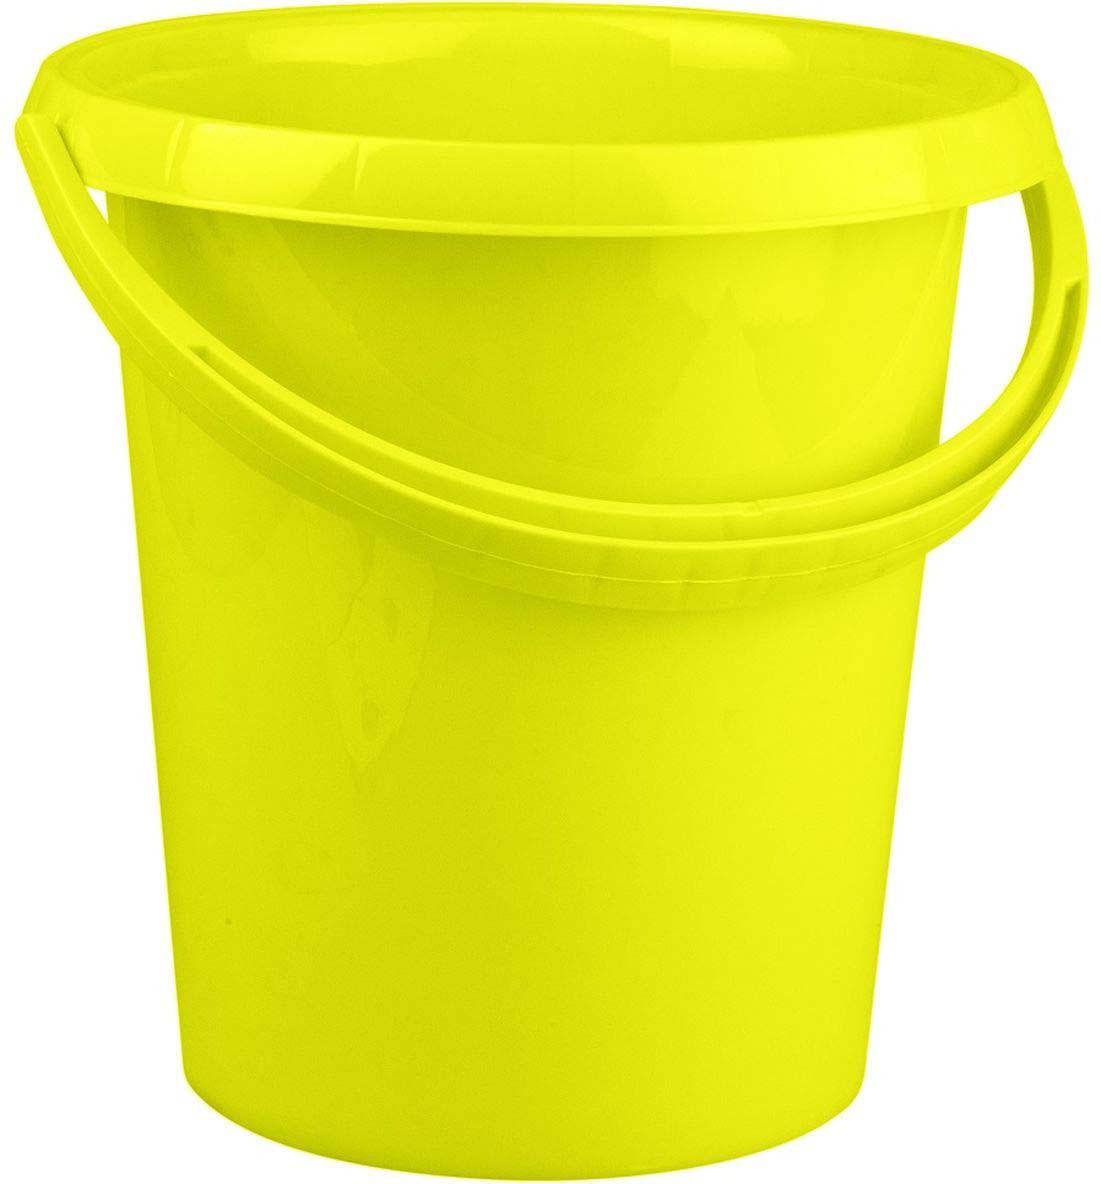 Ведро Plast Team Ampari, цвет: лаймовый, 12 л